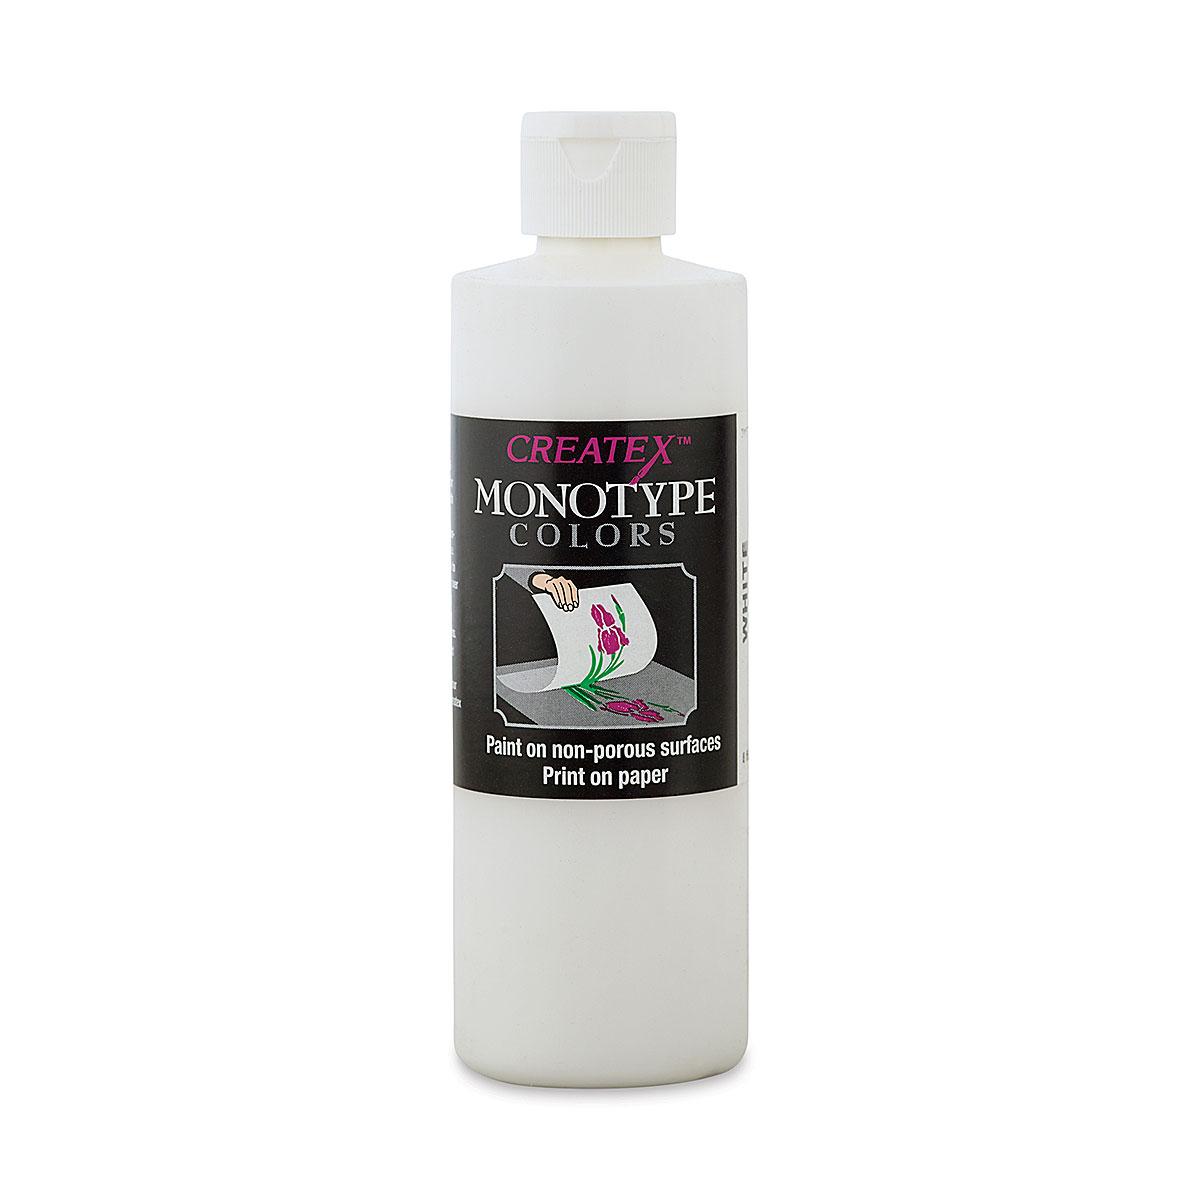 Createx Monotype Colors - White, 8 oz bottle